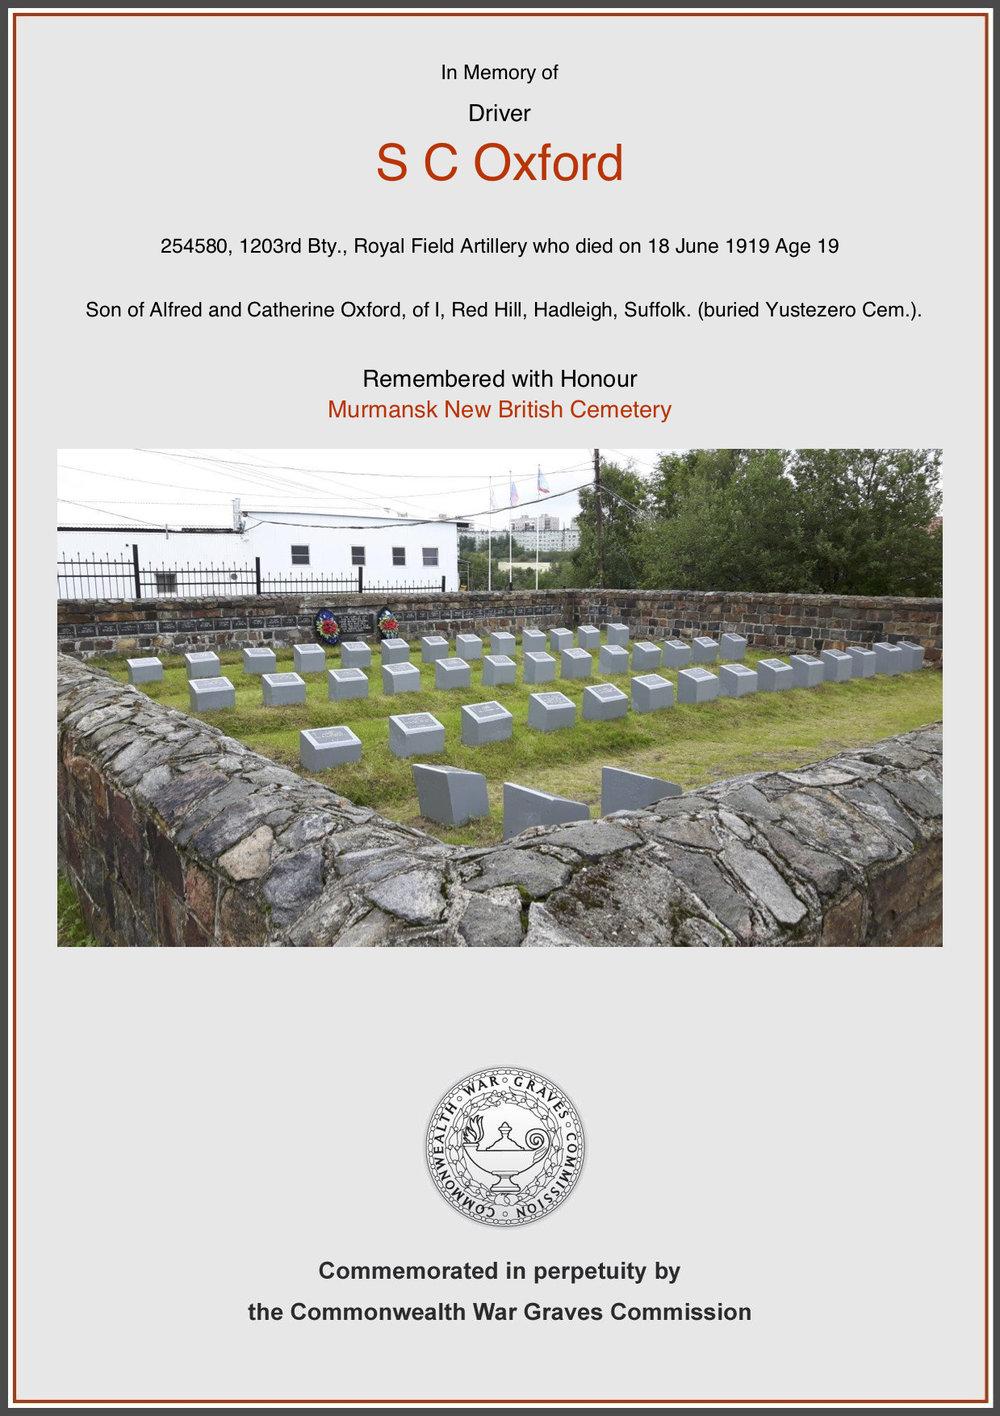 CWGC Commemorative Certificate